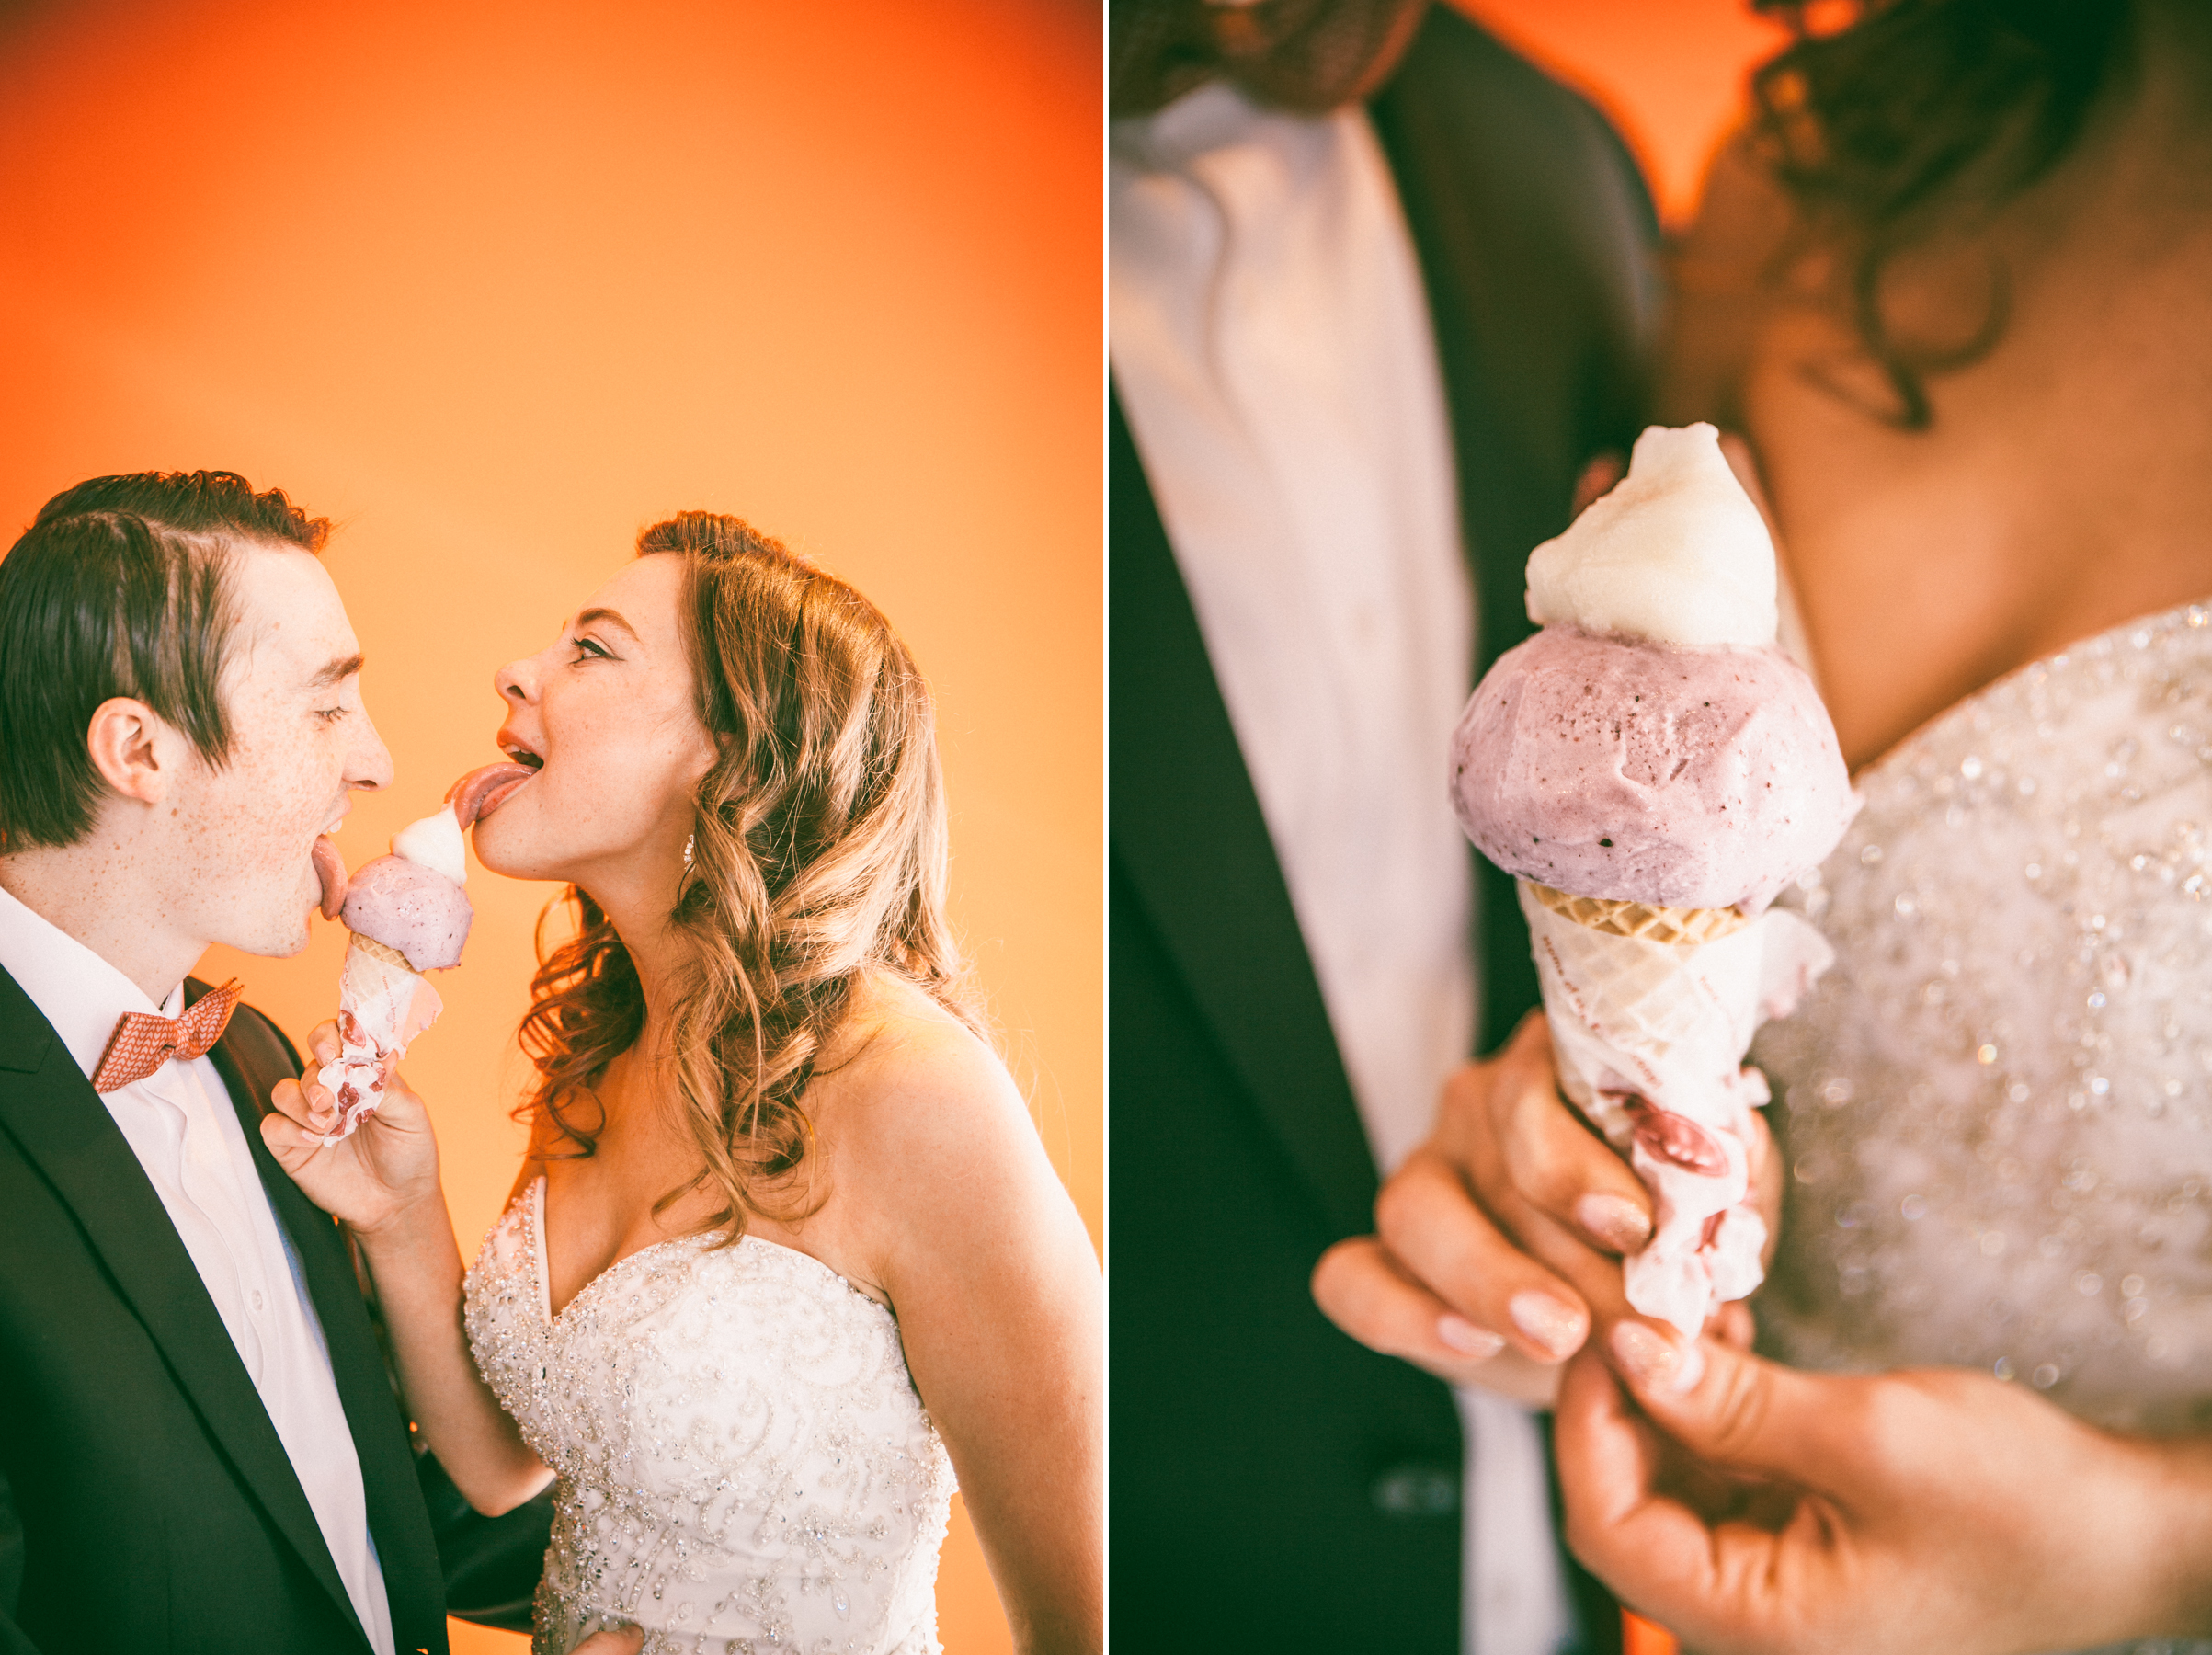 lick ice cream diptic.jpg